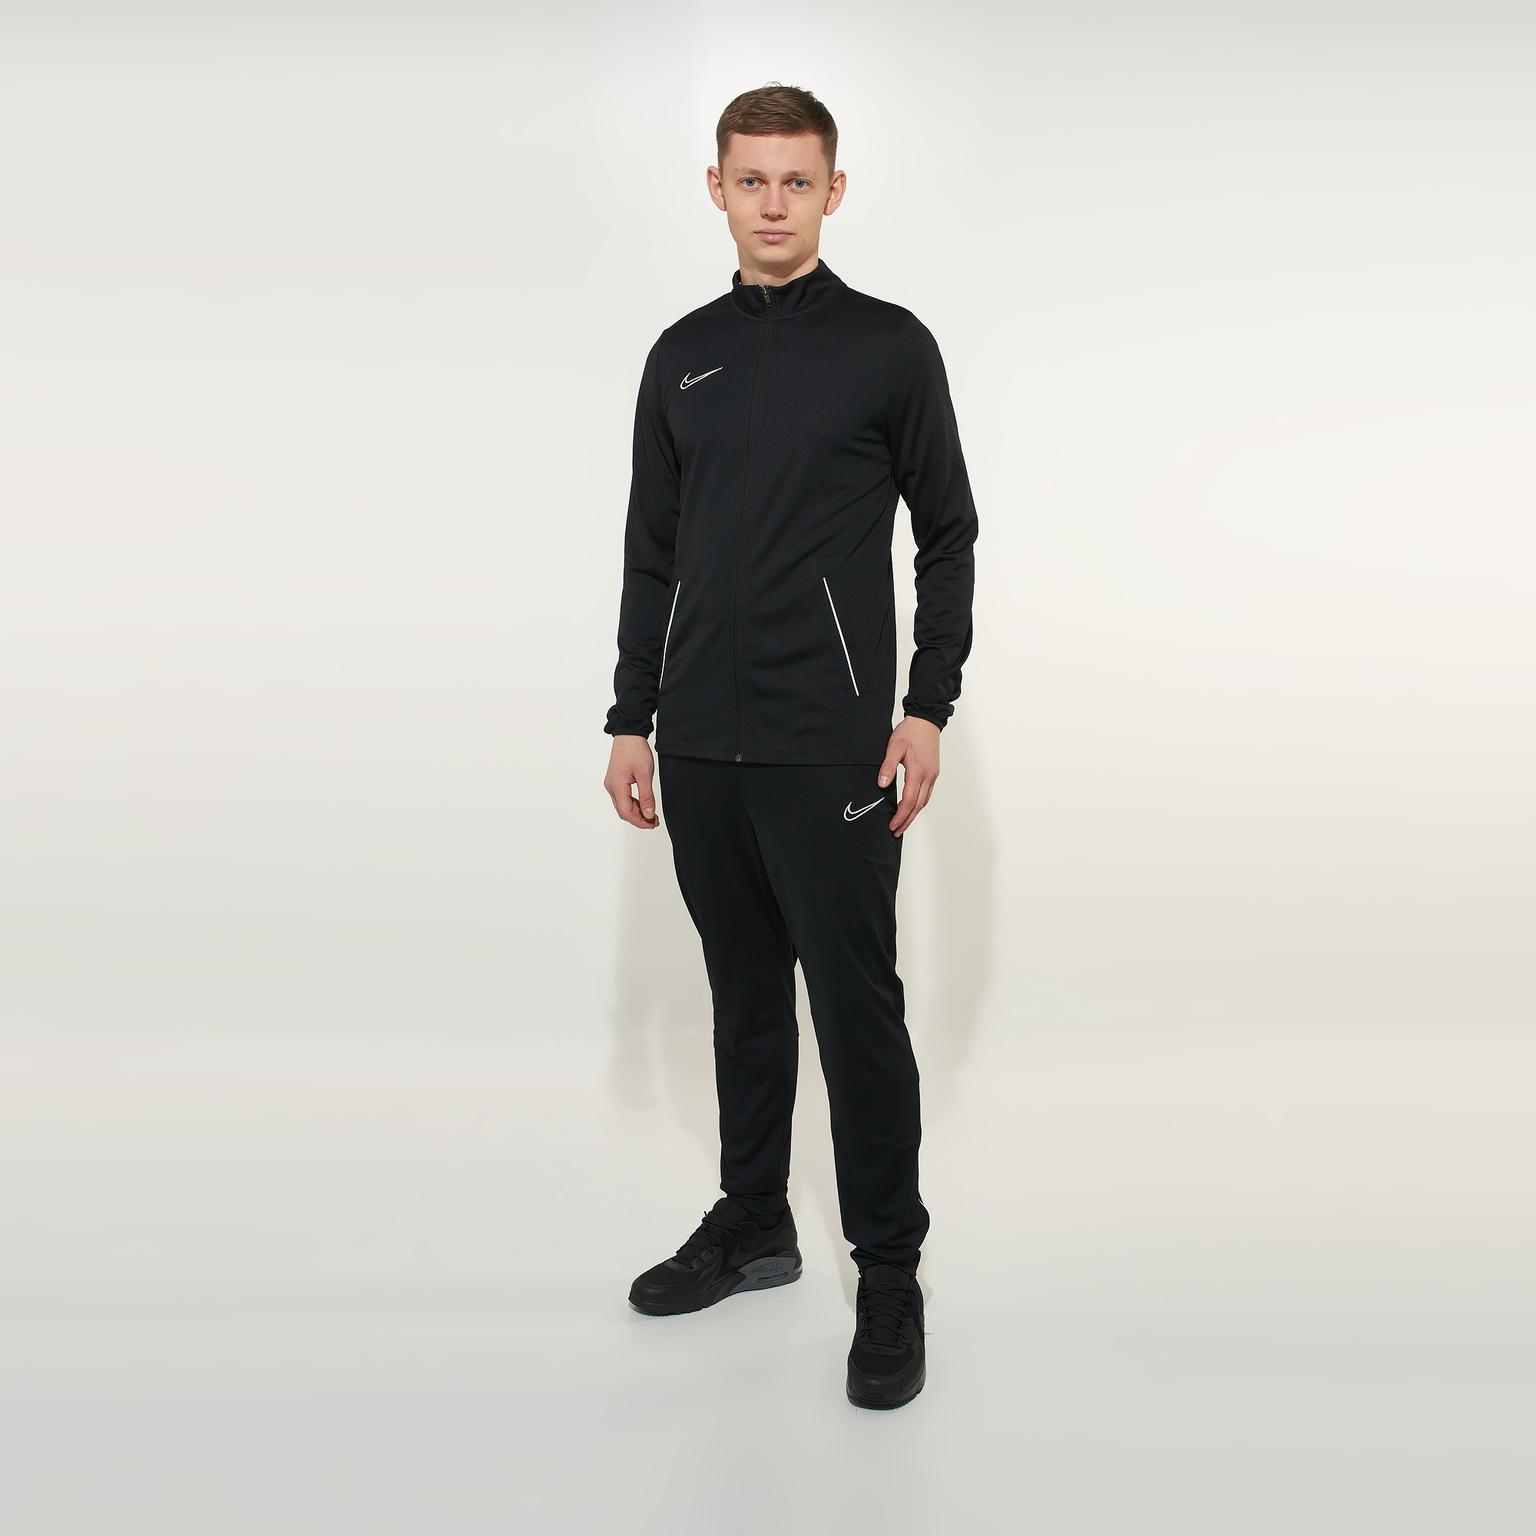 Костюм спортивный Nike Academy21 CW6131-010 костюм спортивный nike spe fleece suit bv3017 058